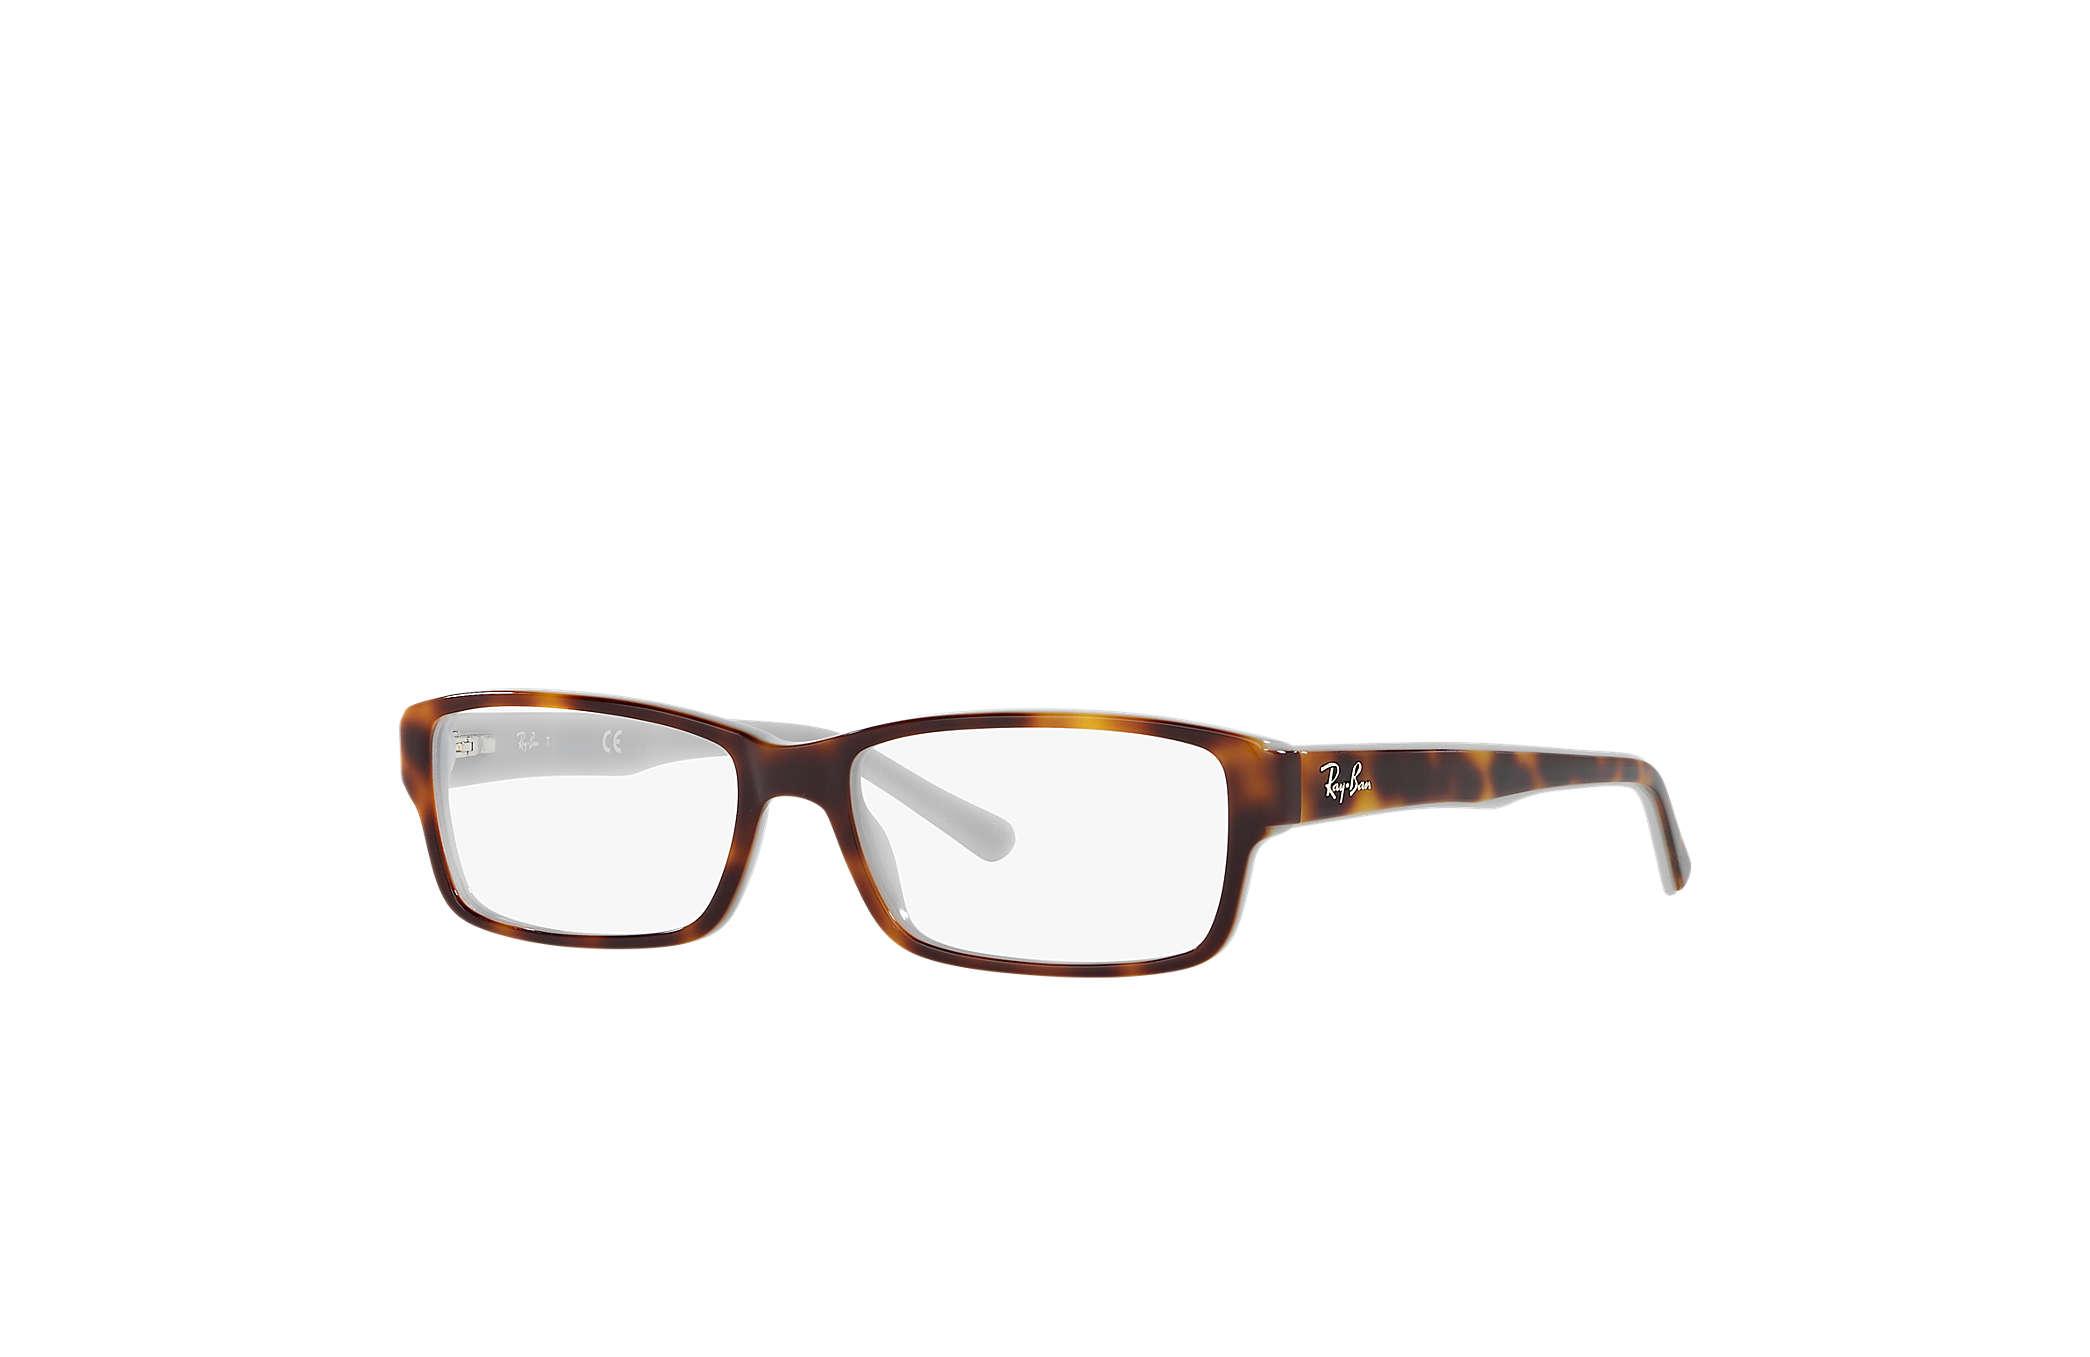 30c7b66a84 Ray-Ban prescription glasses RB5169 Tortoise - Acetate ...